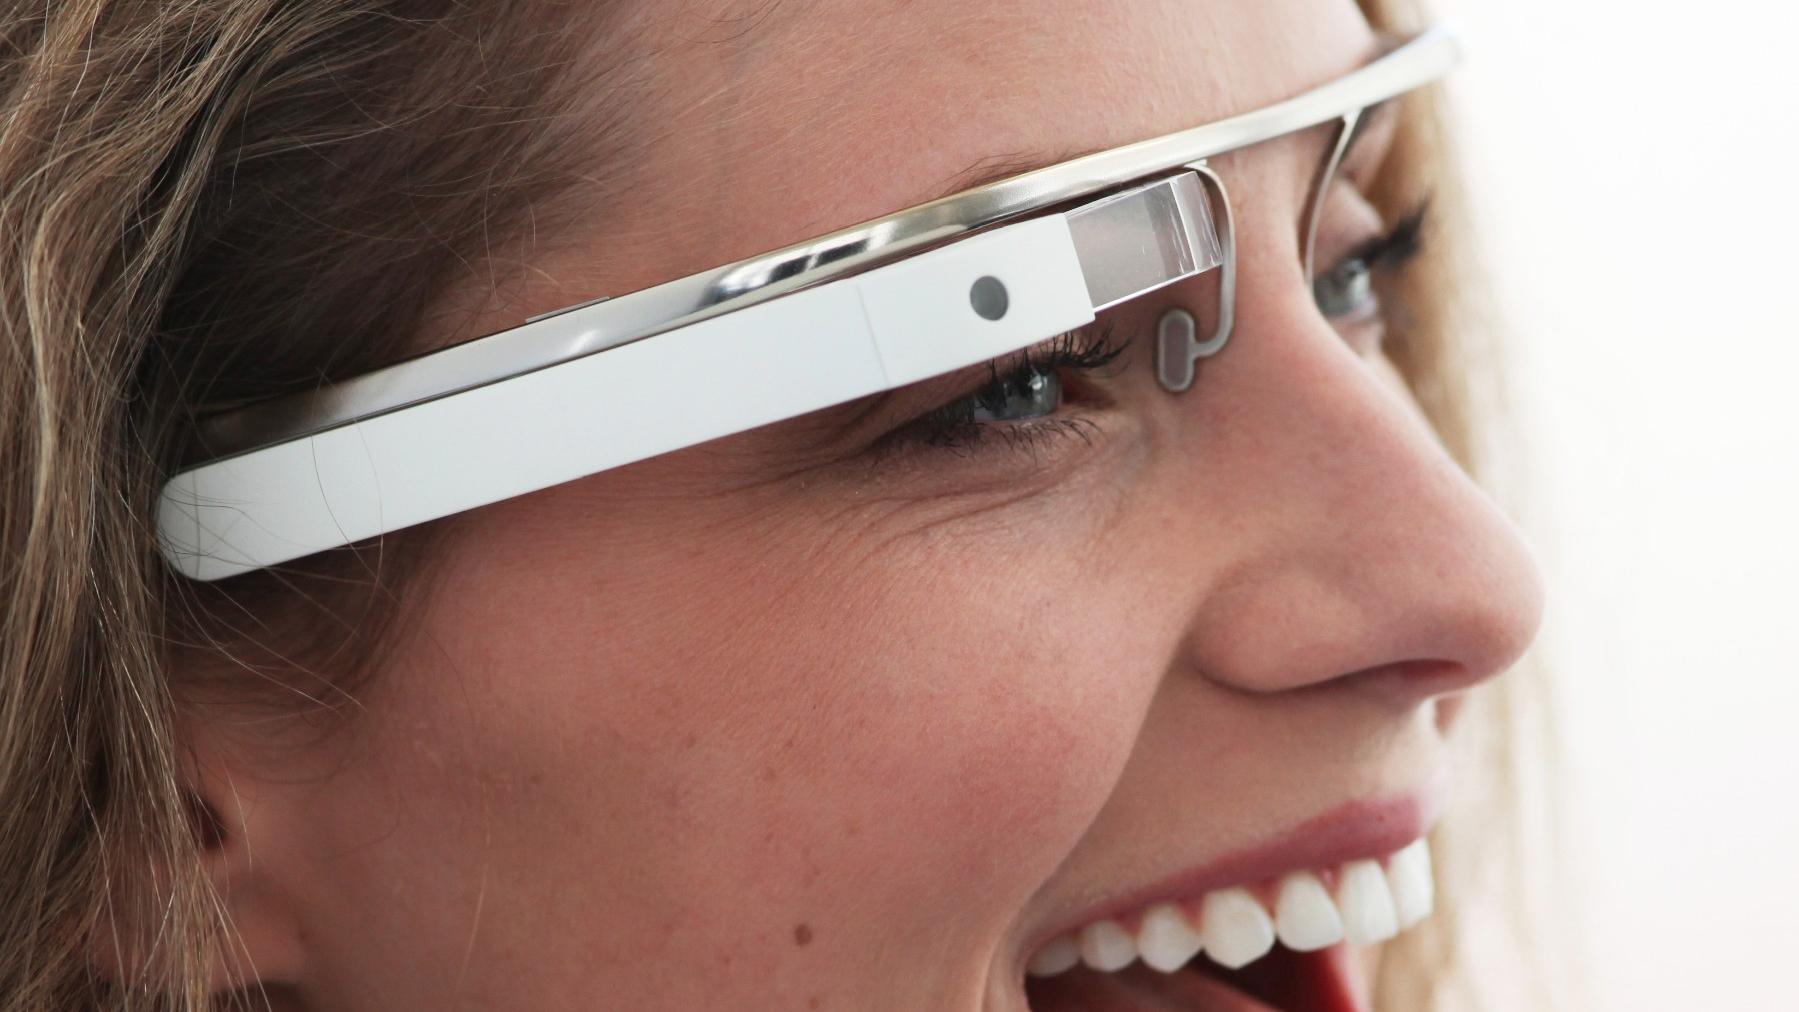 Google patents eye-tracking for Google Glass | TechRadar